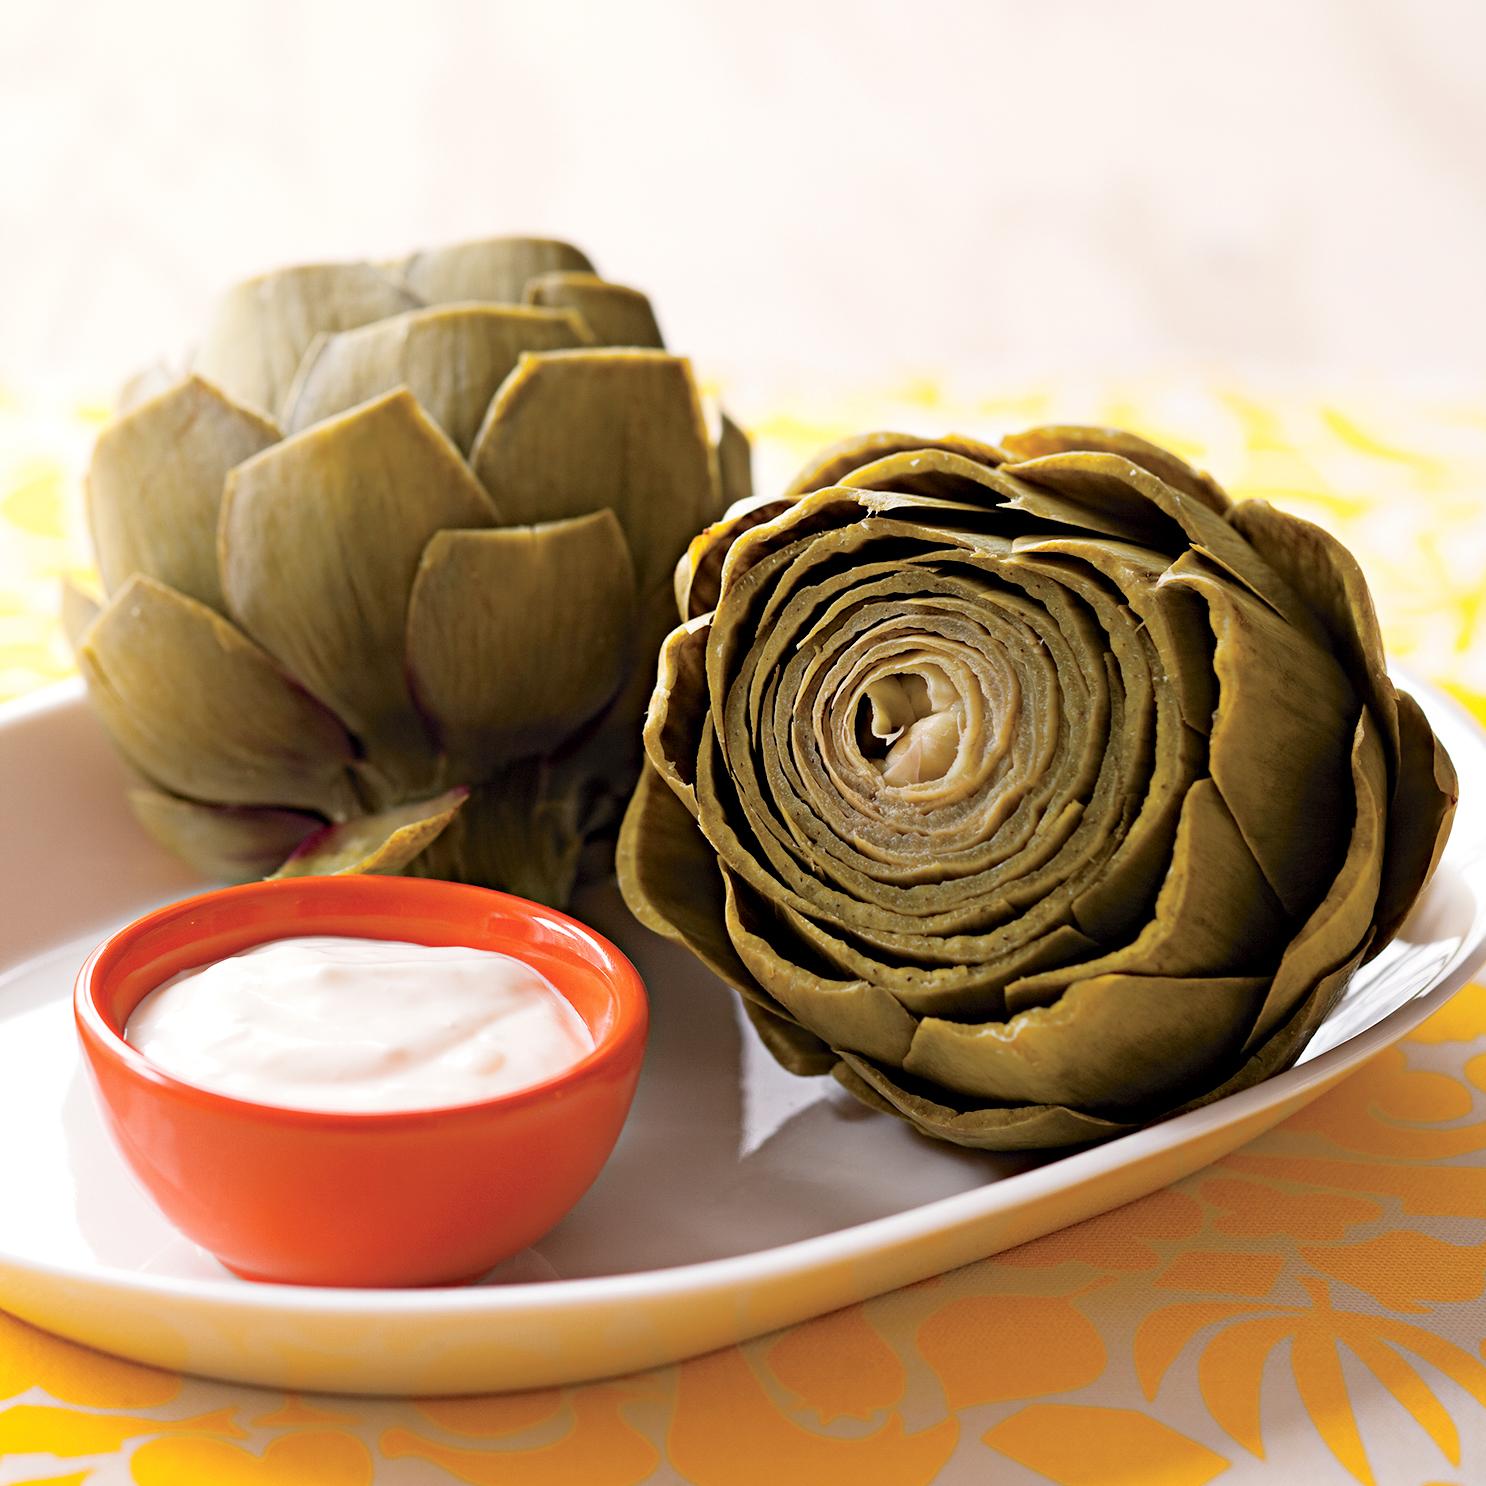 Artichokes with Lemon-Garlic Sauce